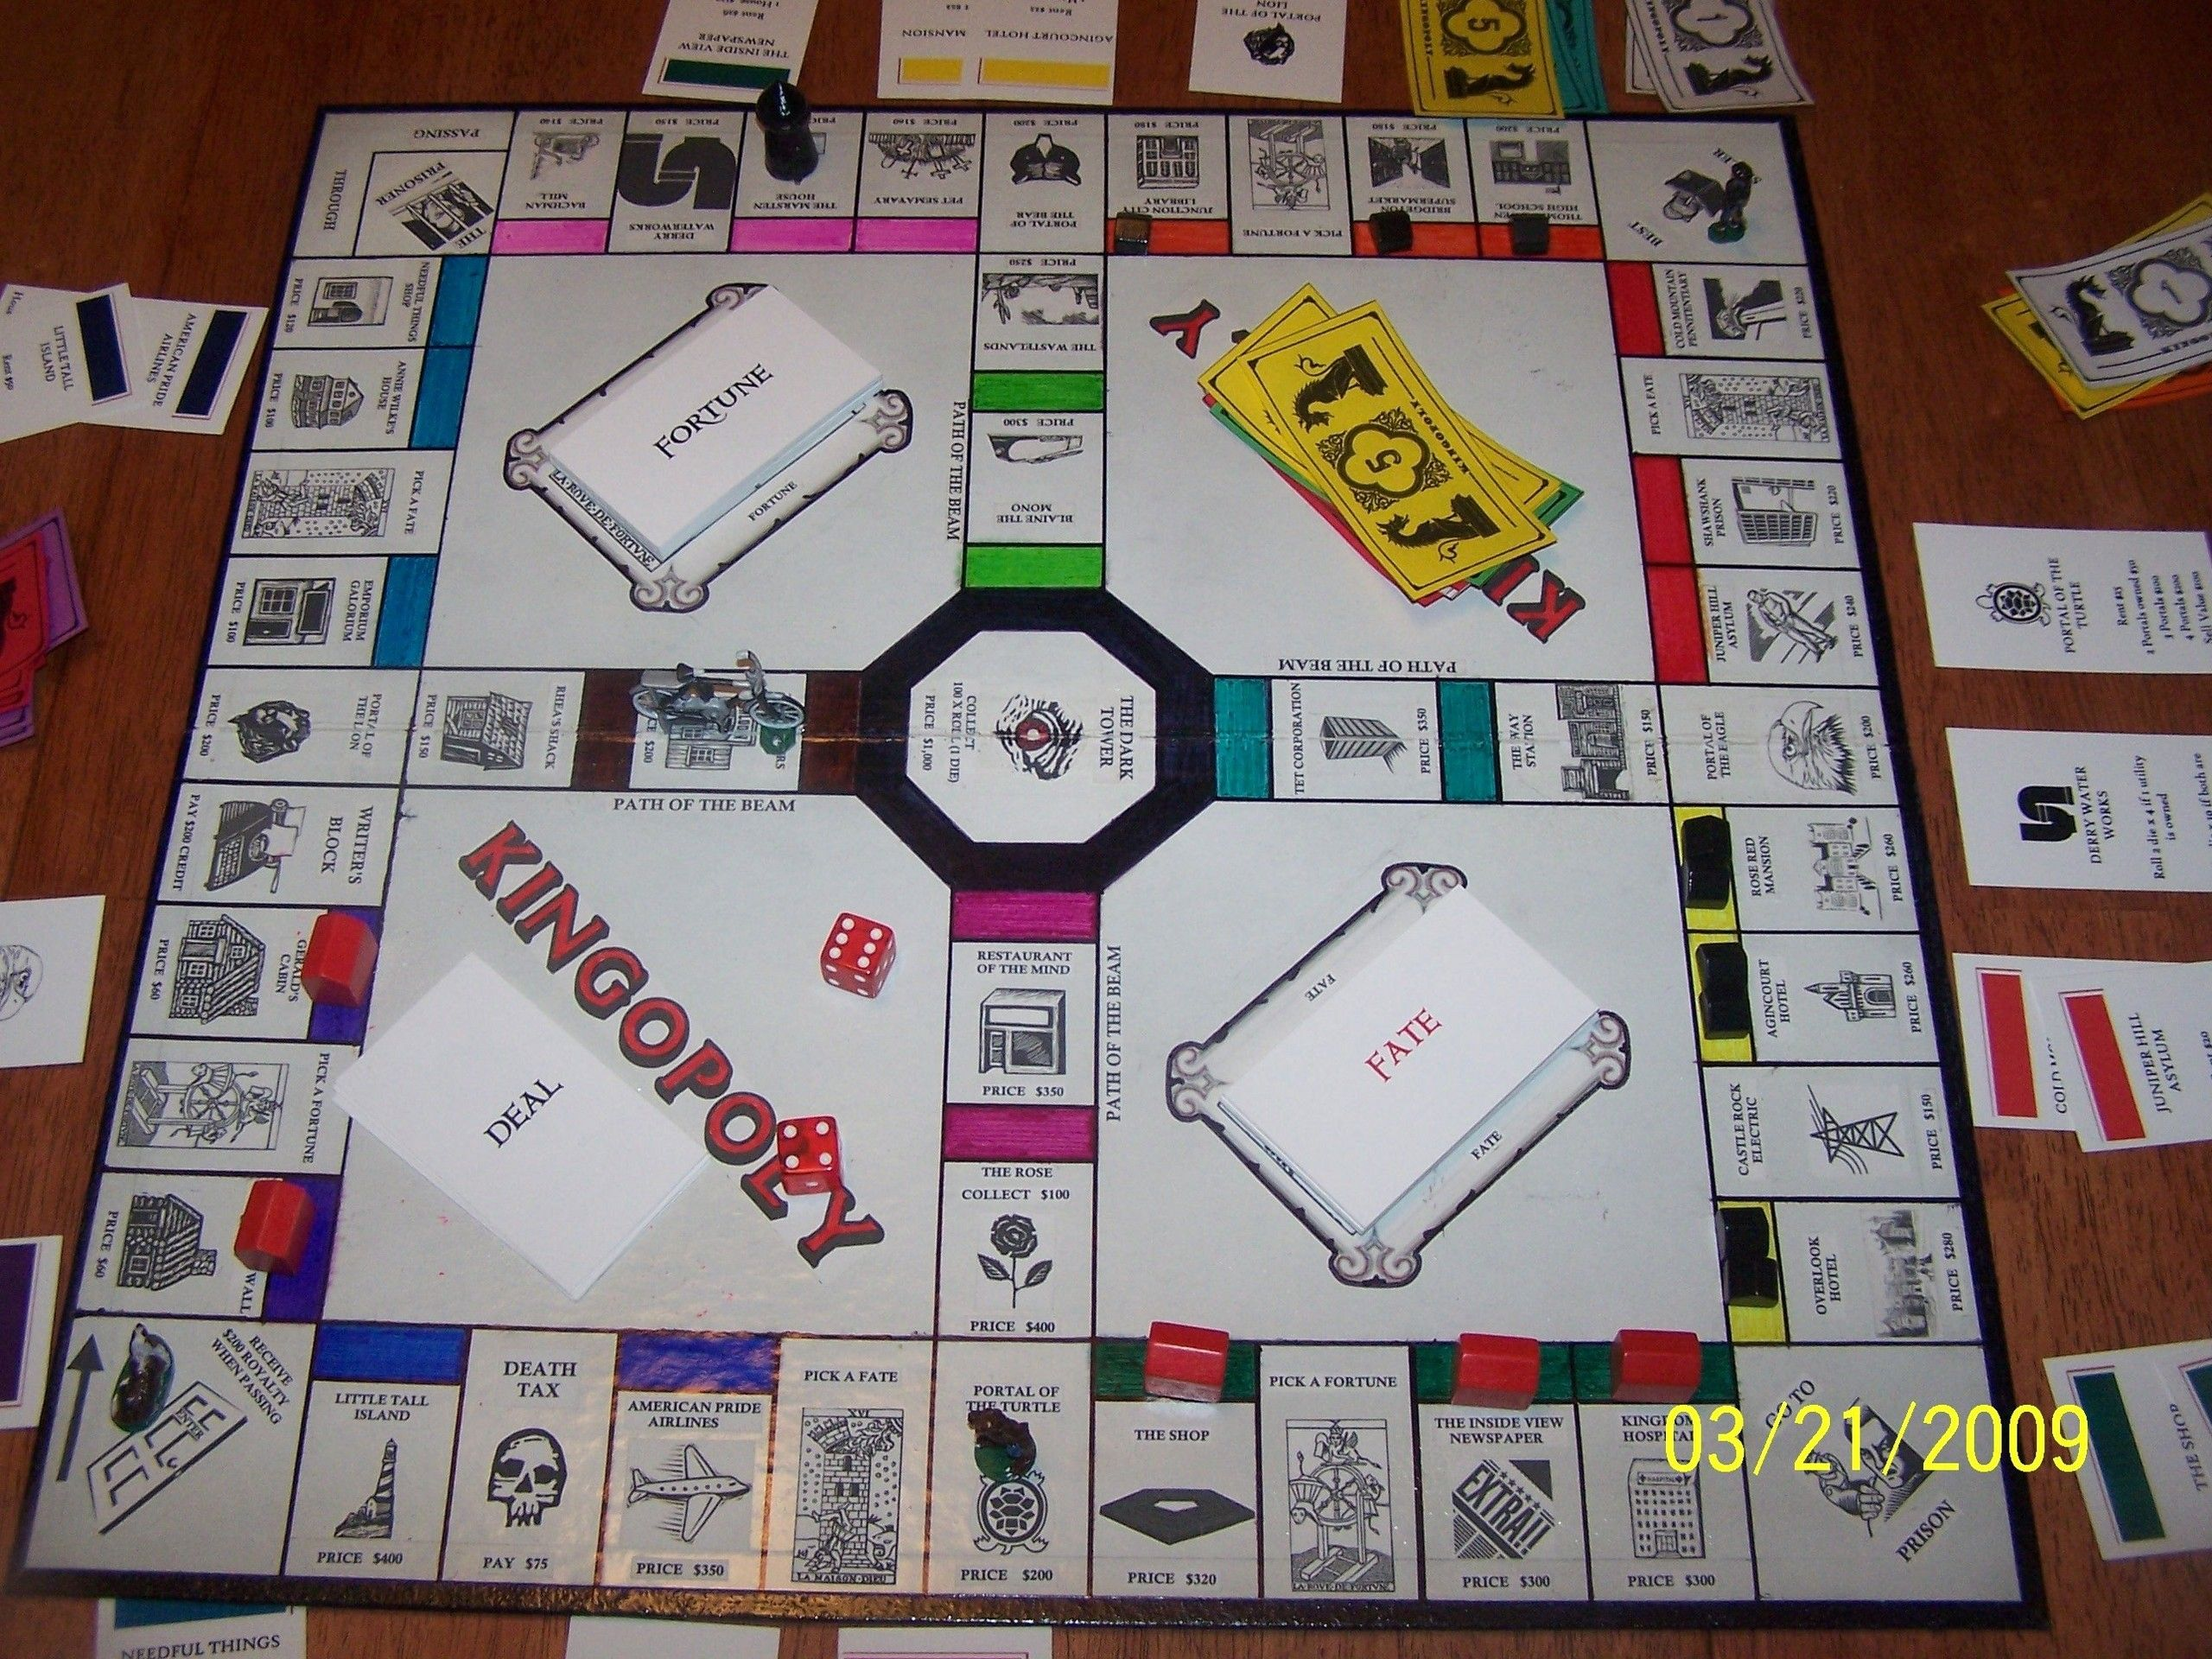 Kingopoly In Play